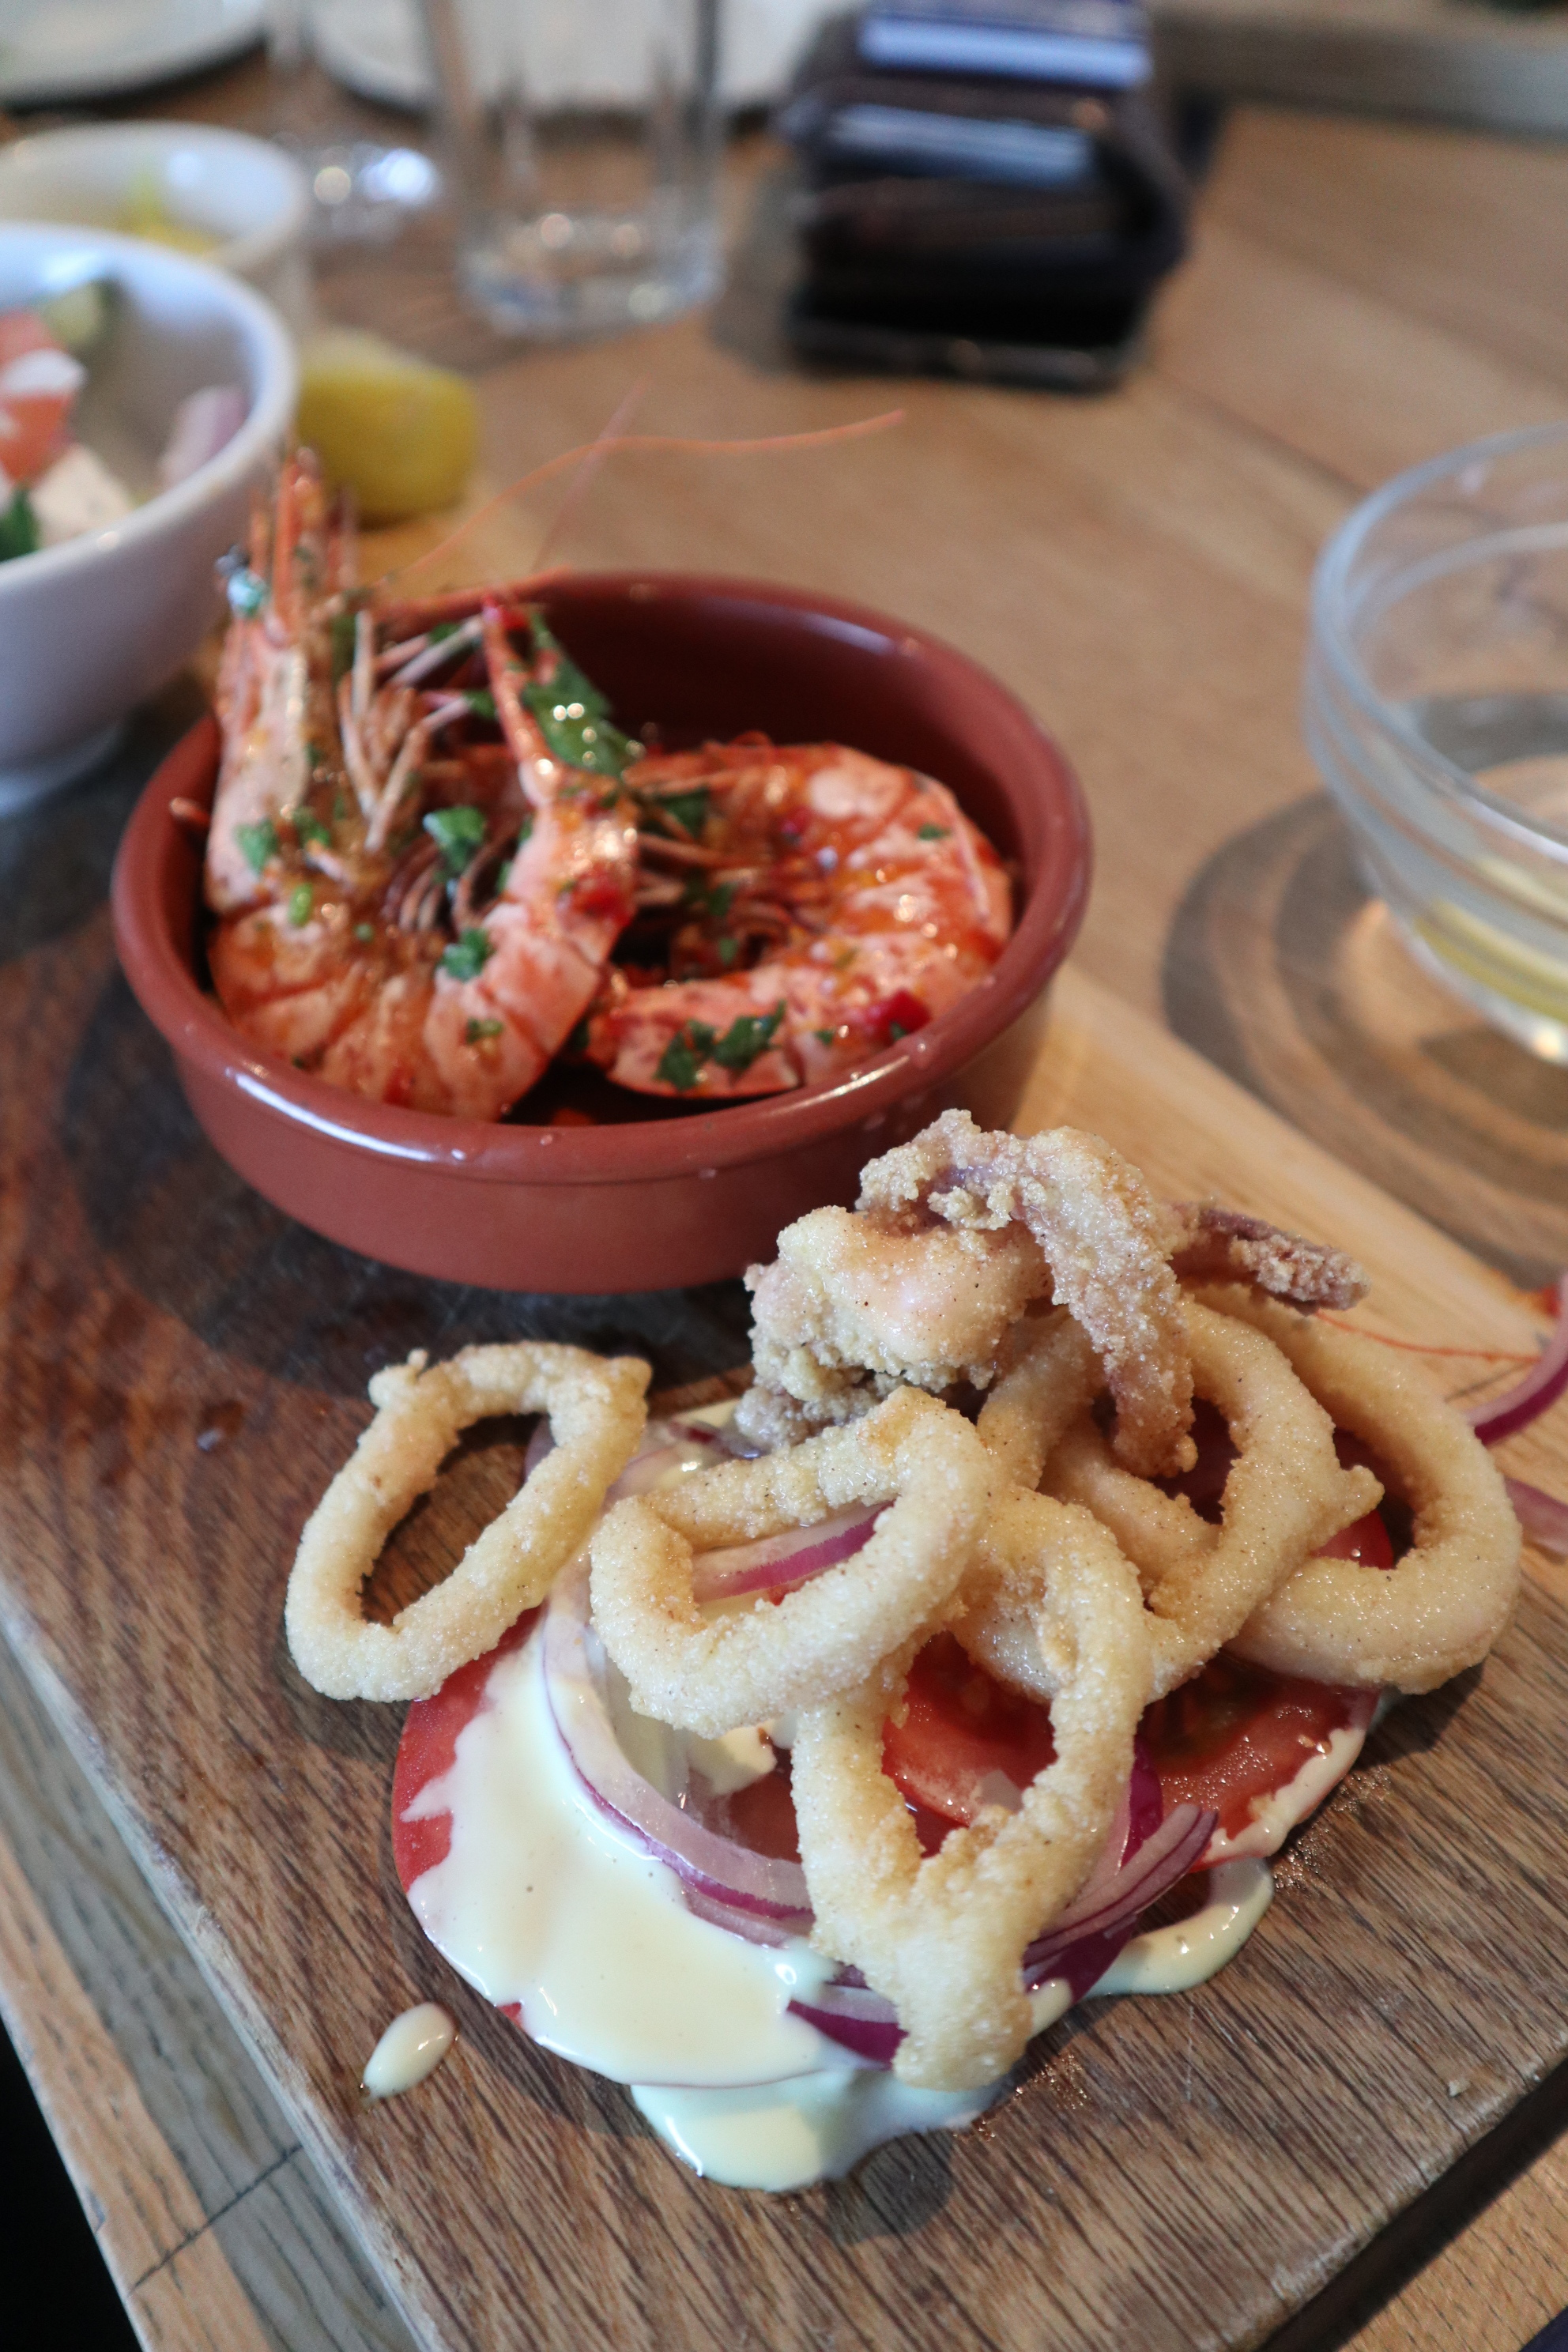 Tasting board at Rick Stein including padron peppers, chilli prawns, salt cod fitters, greek salad and calamari